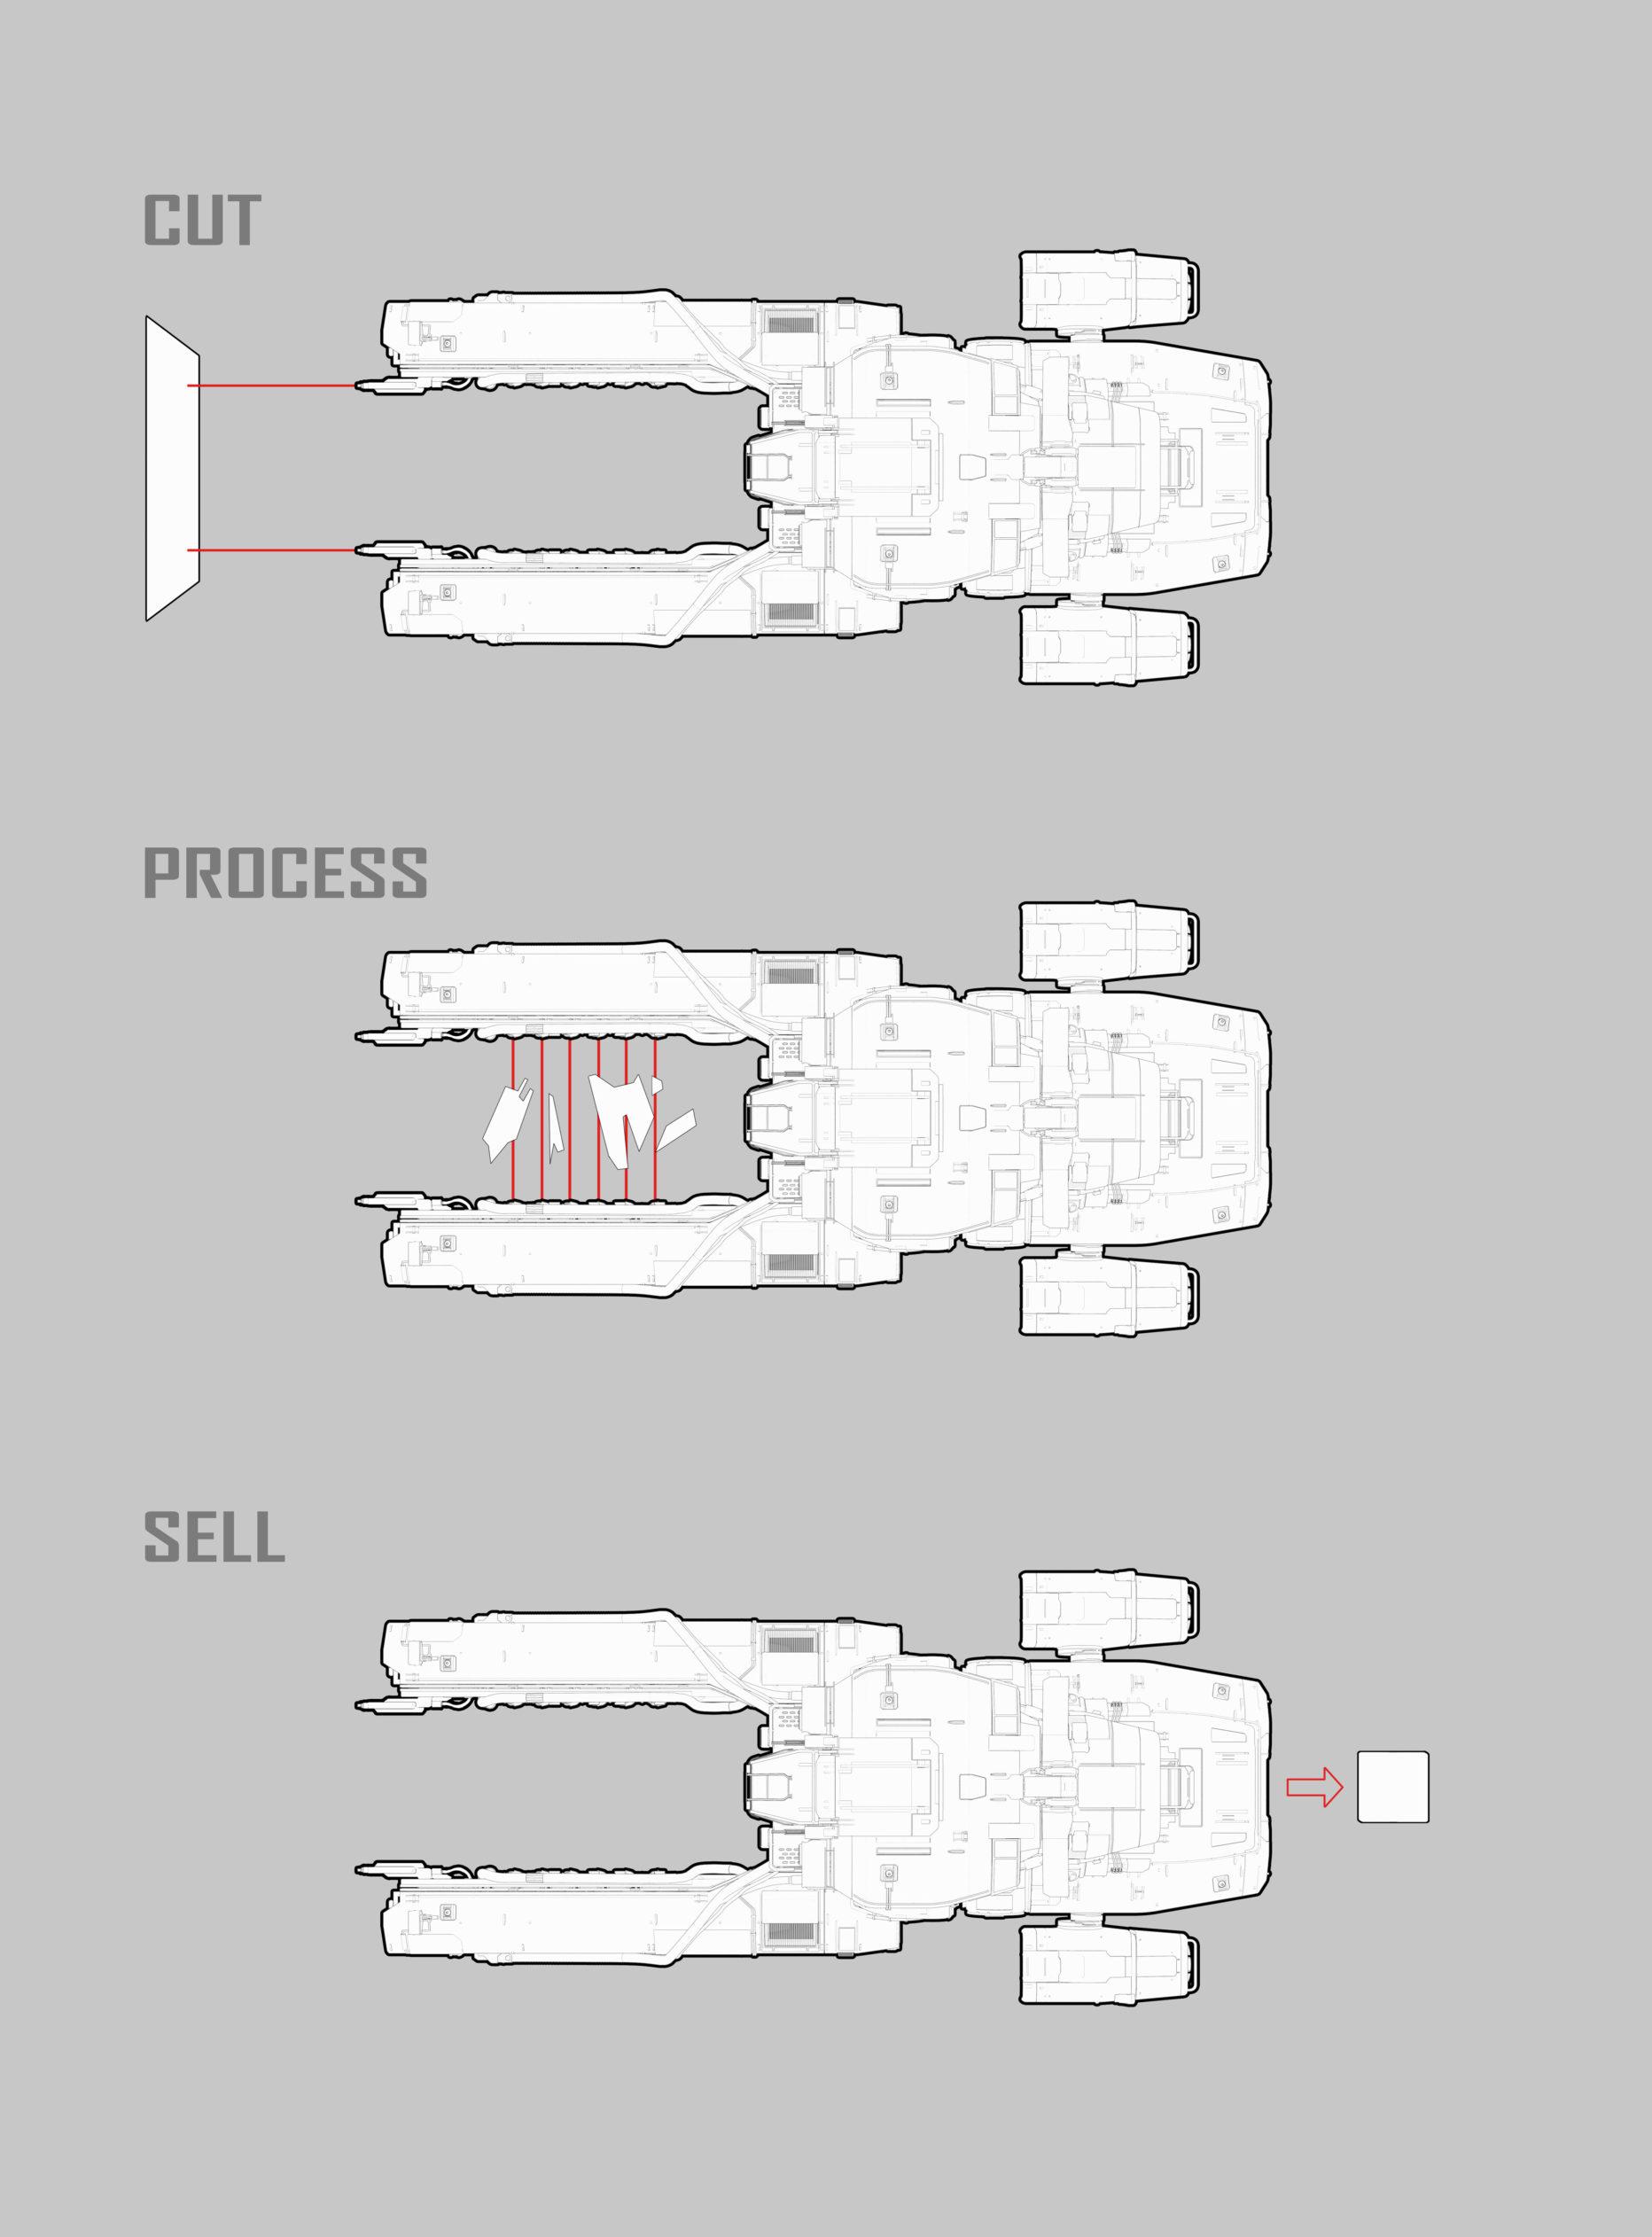 SC-Vulture-Vault-Concept-A-13.jpg